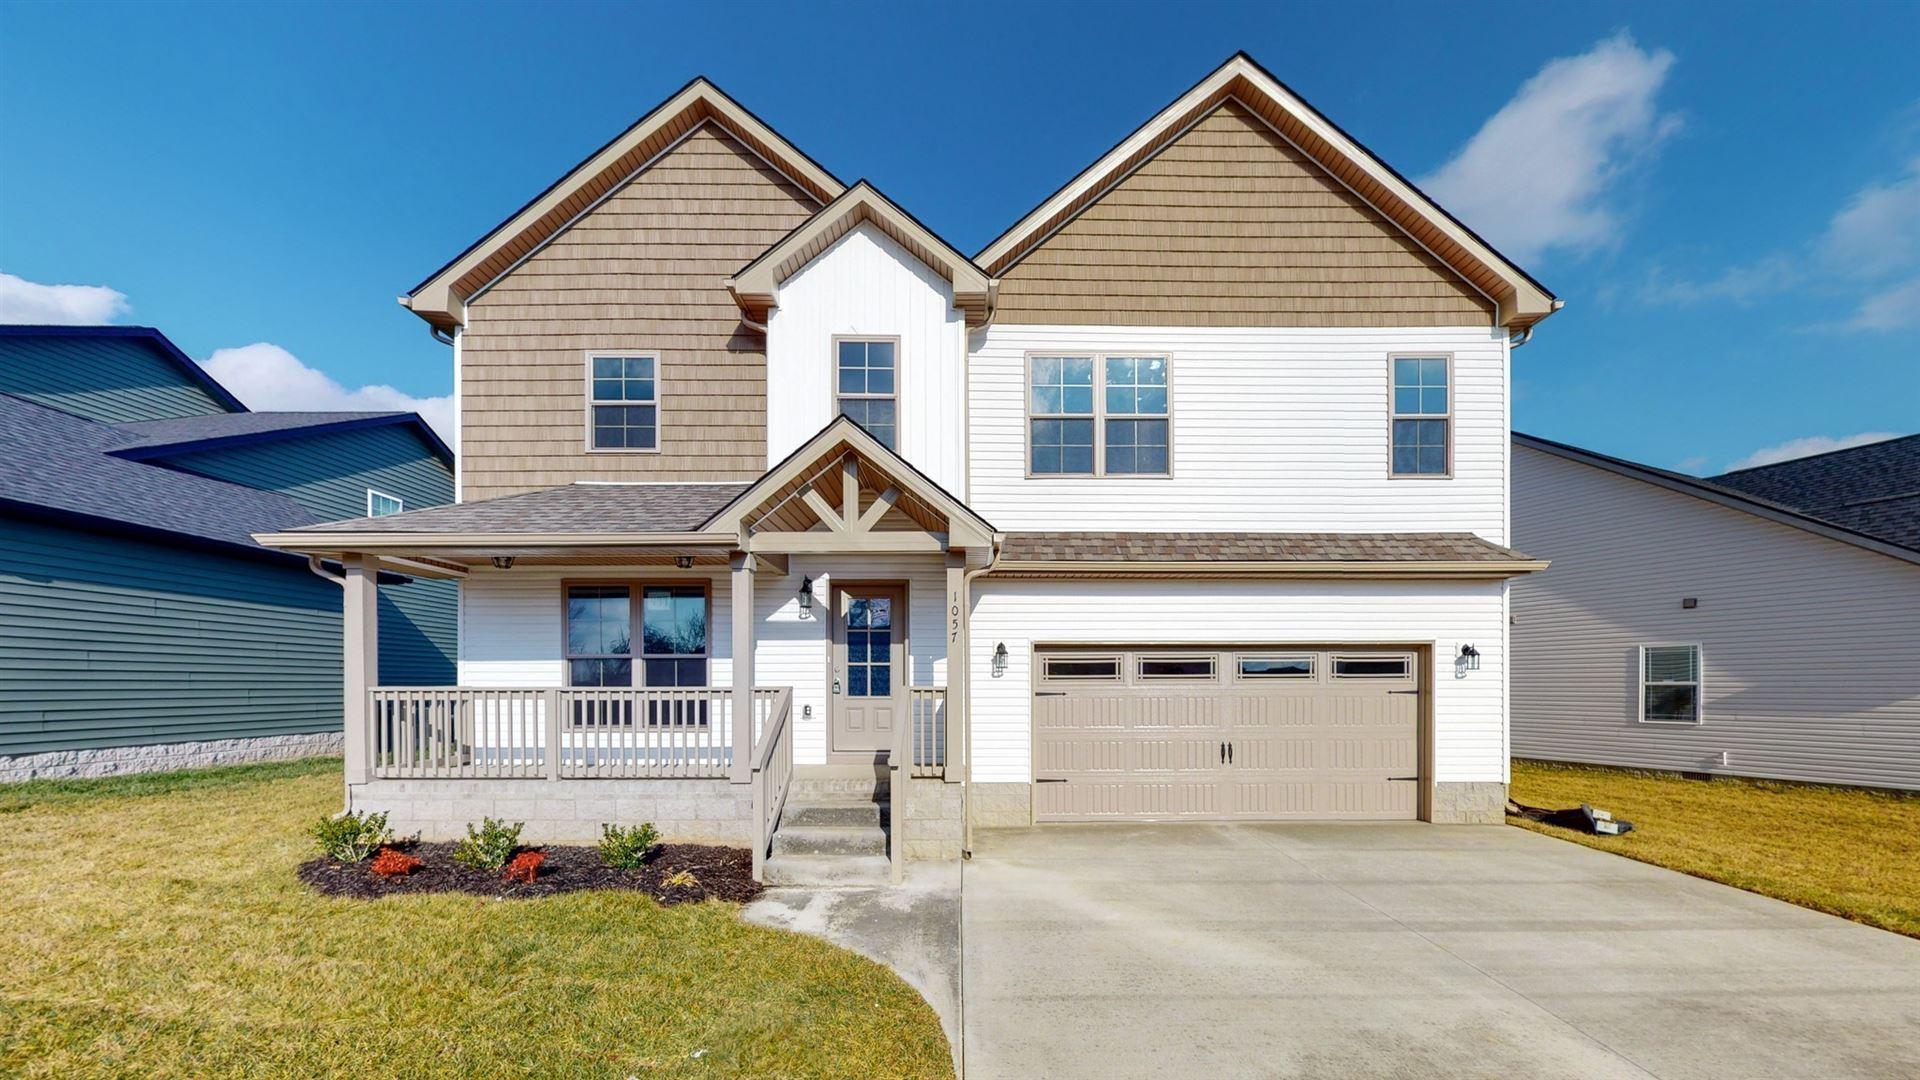 125 Schroer Rd, Clarksville, TN 37042 - MLS#: 2225297